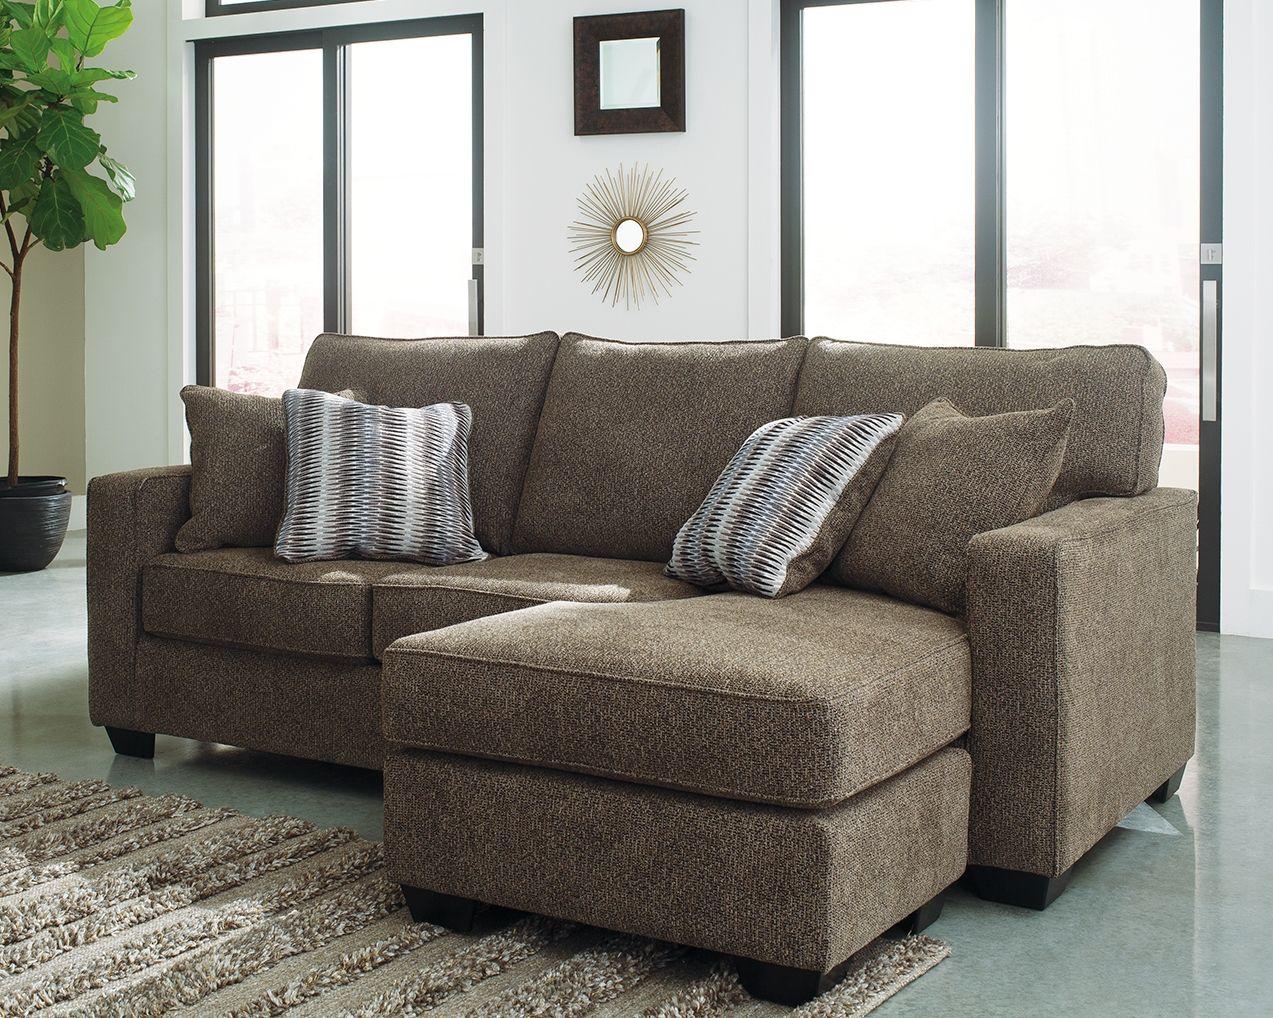 Ladale Sofa Chaise Granite Ashley Furniture Furniture Chaise Sofa